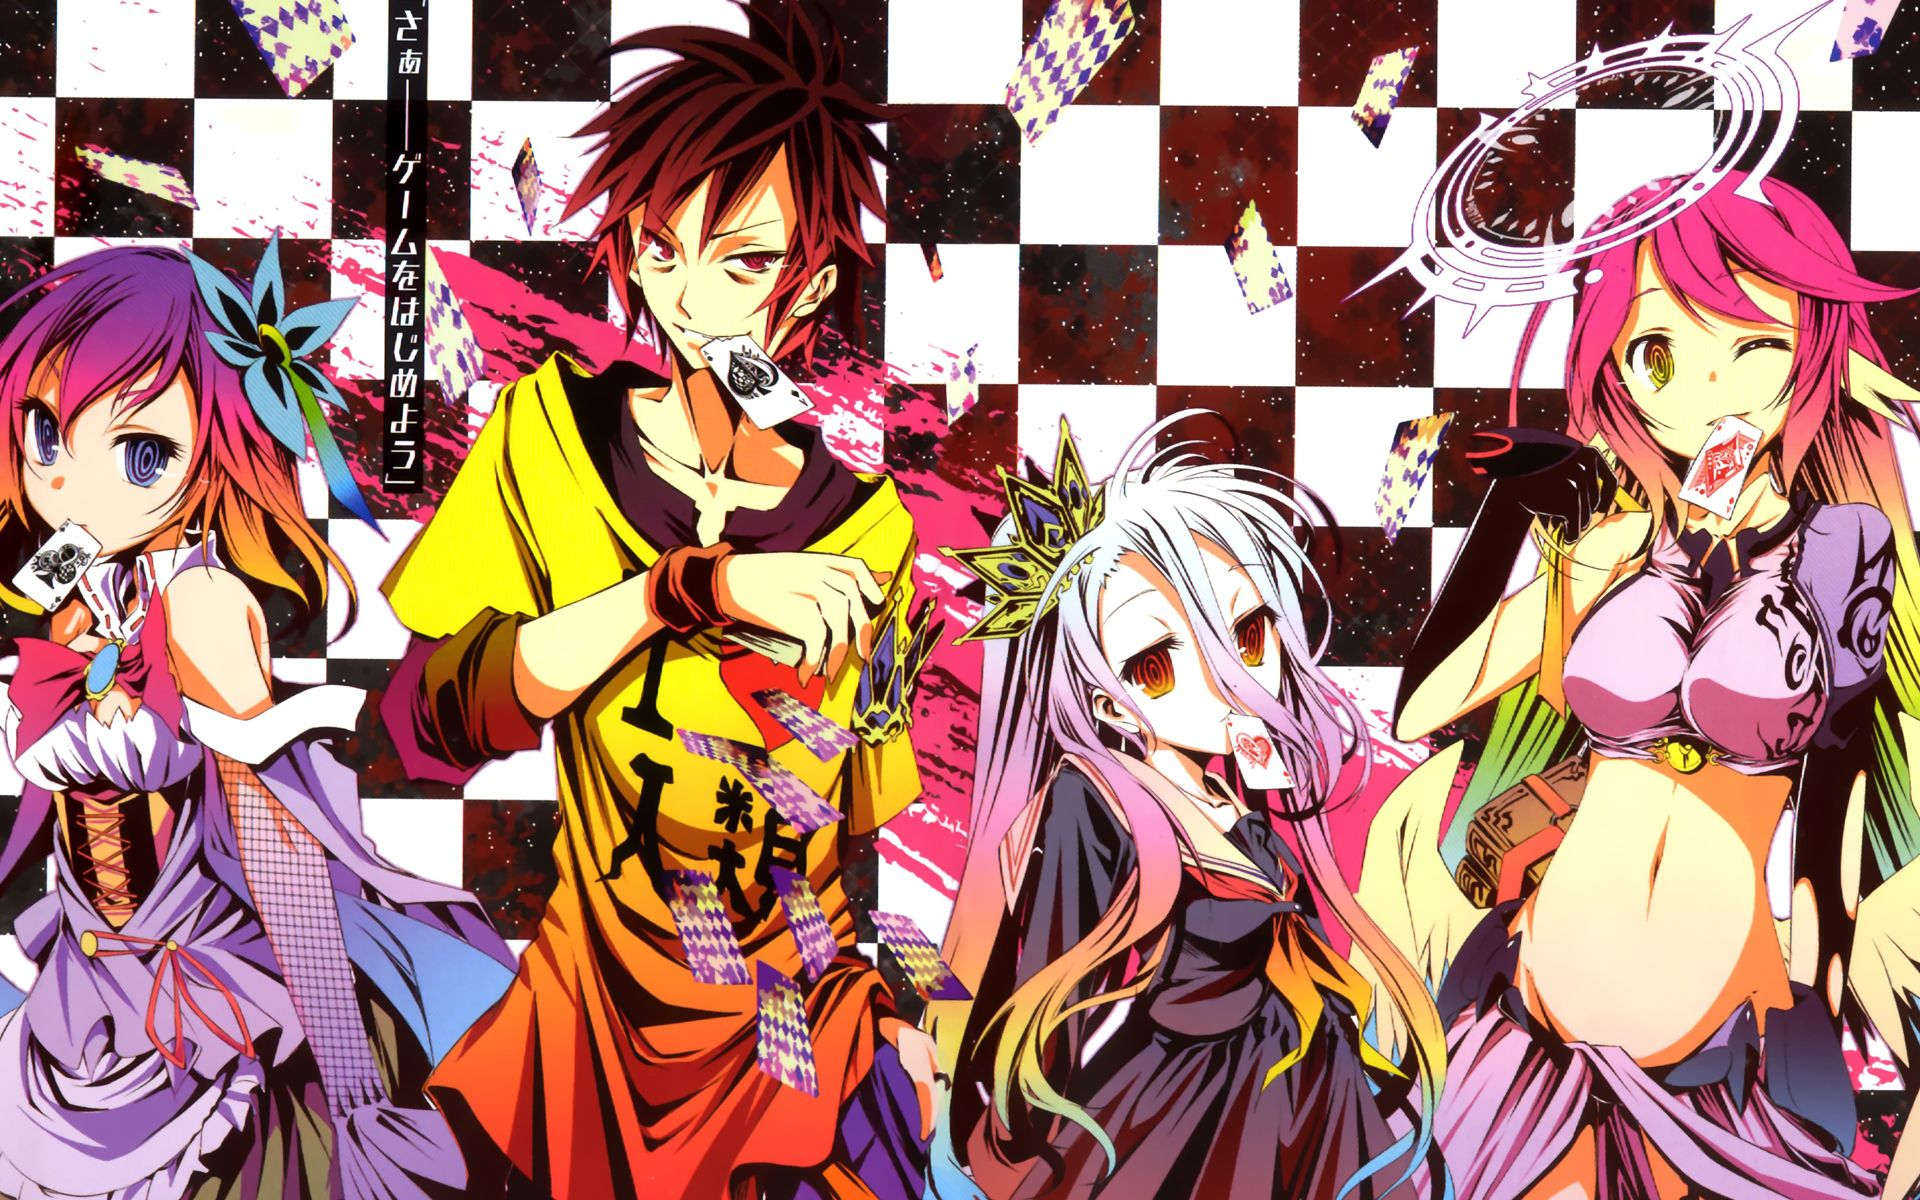 No Game No Life Wallpaper Nogame No Life Anime Games